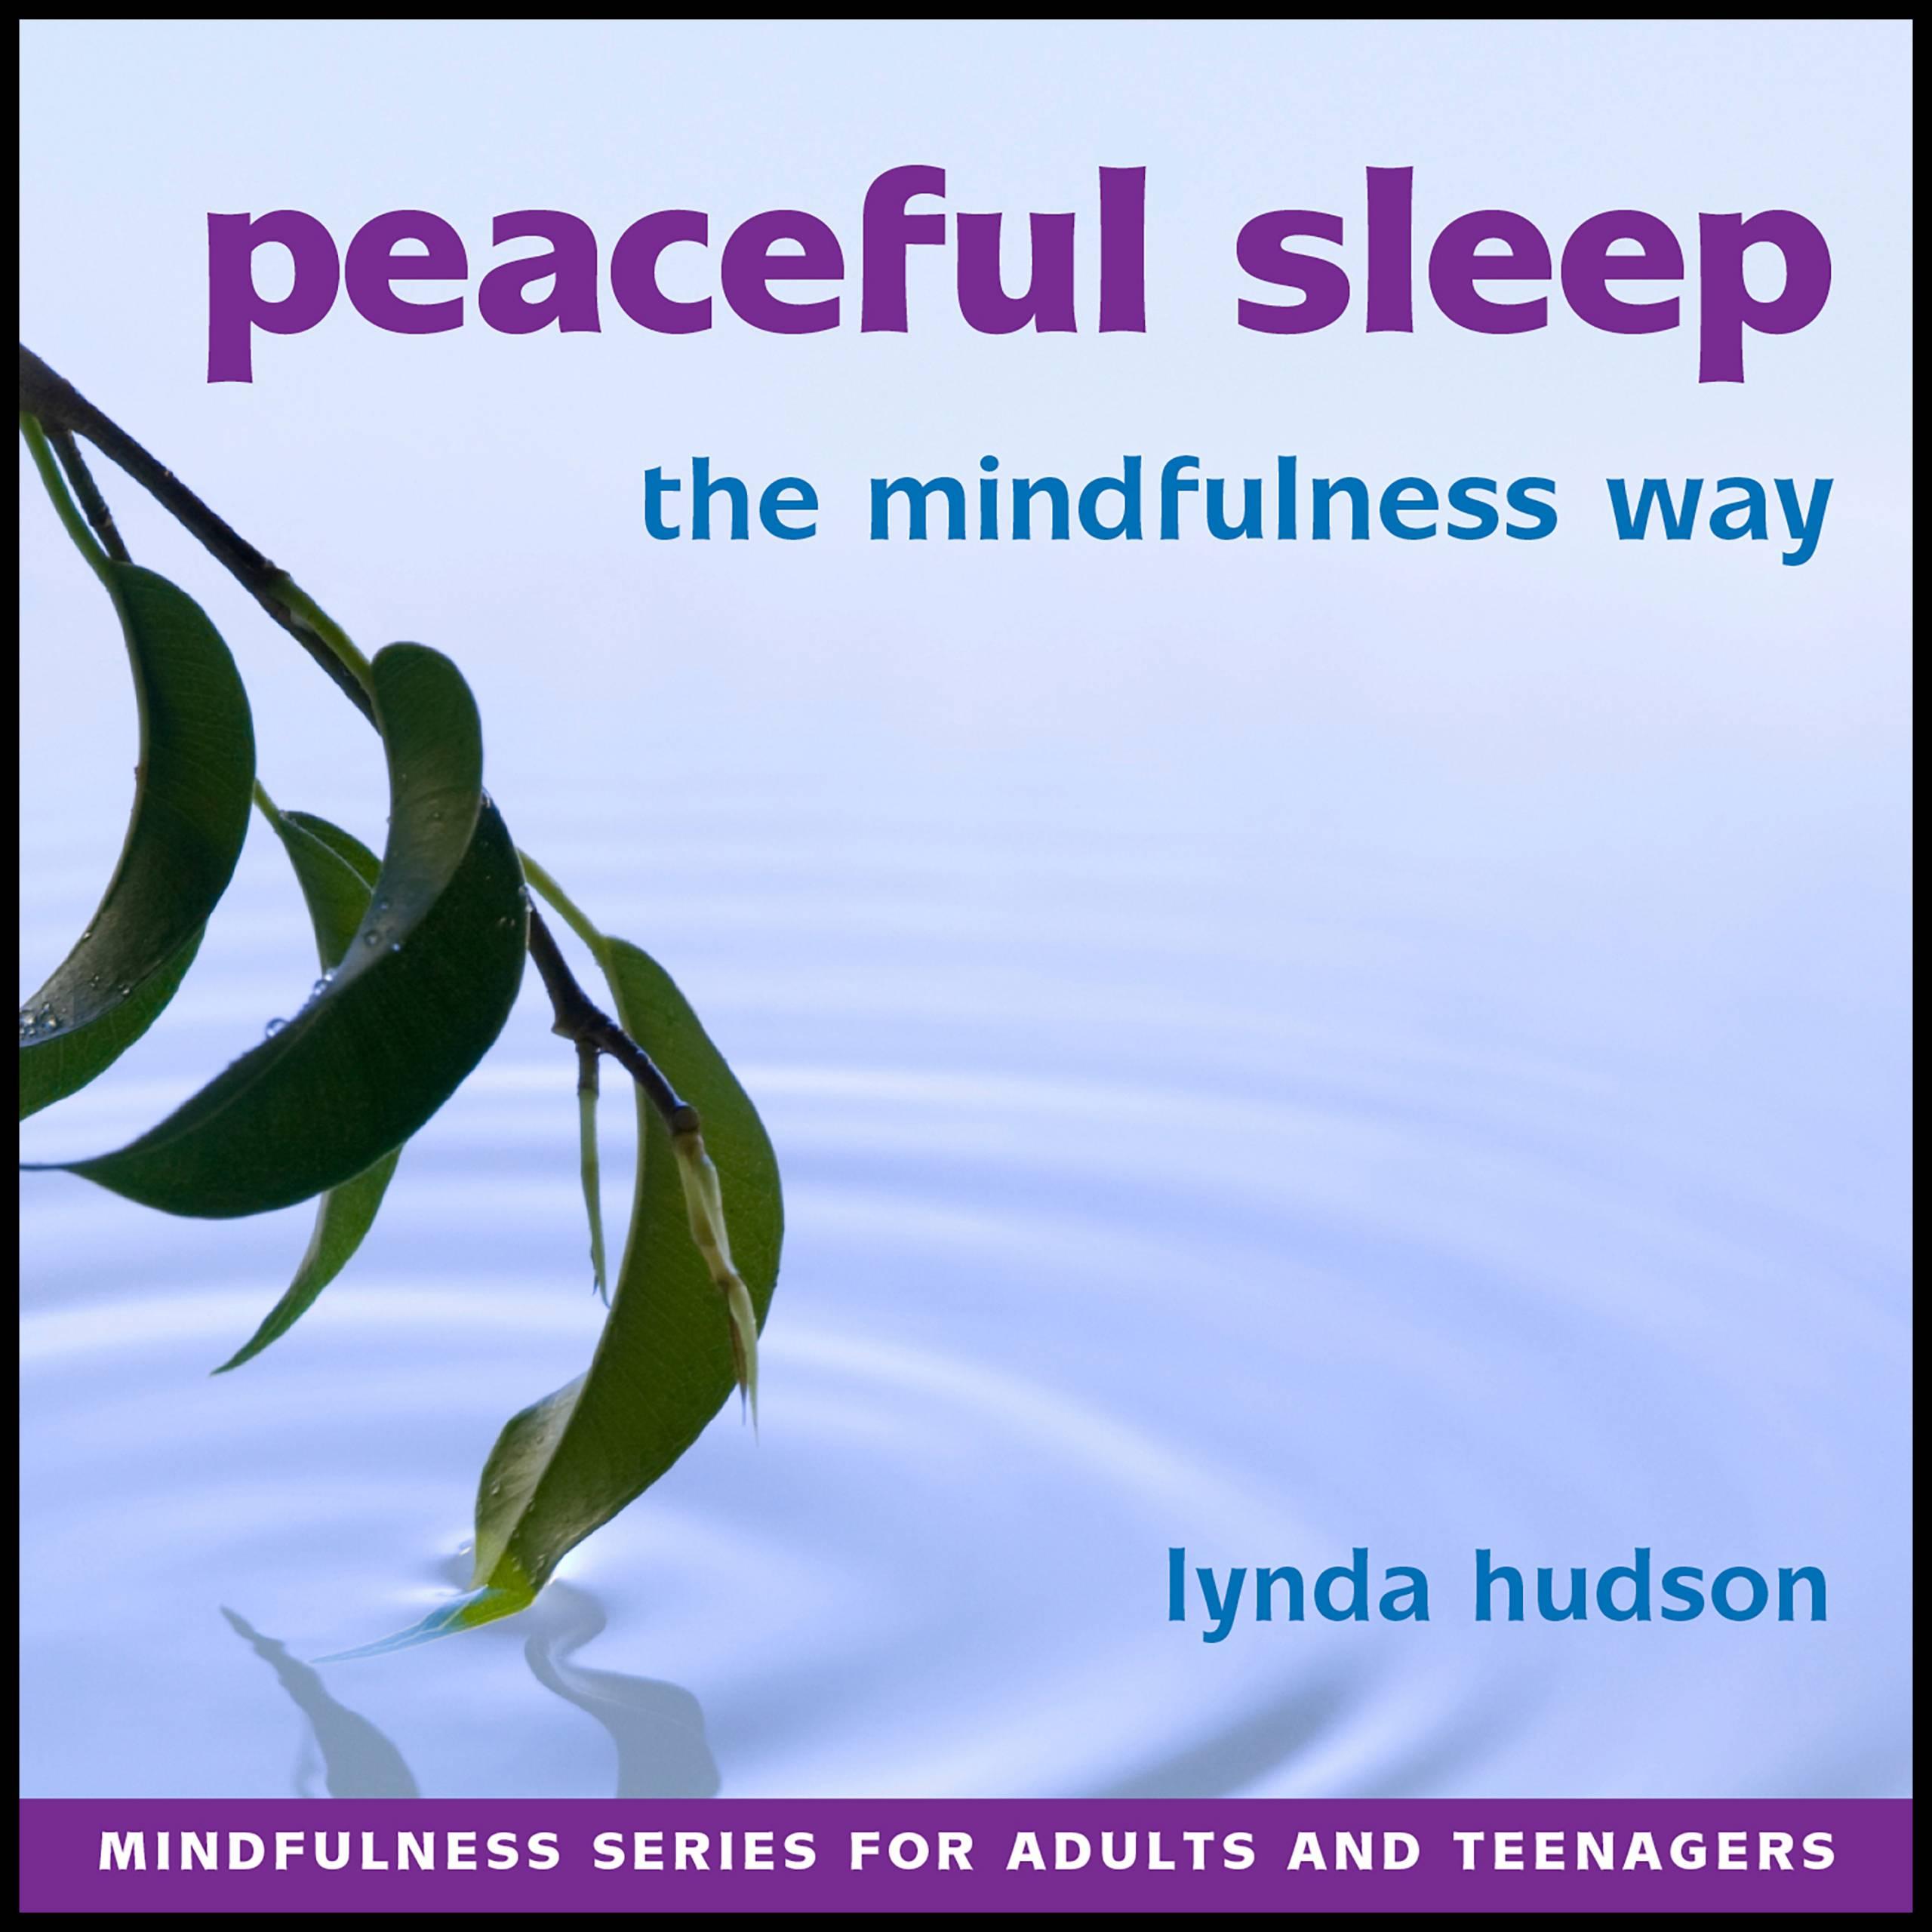 Peaceful sleep the mindfulness way